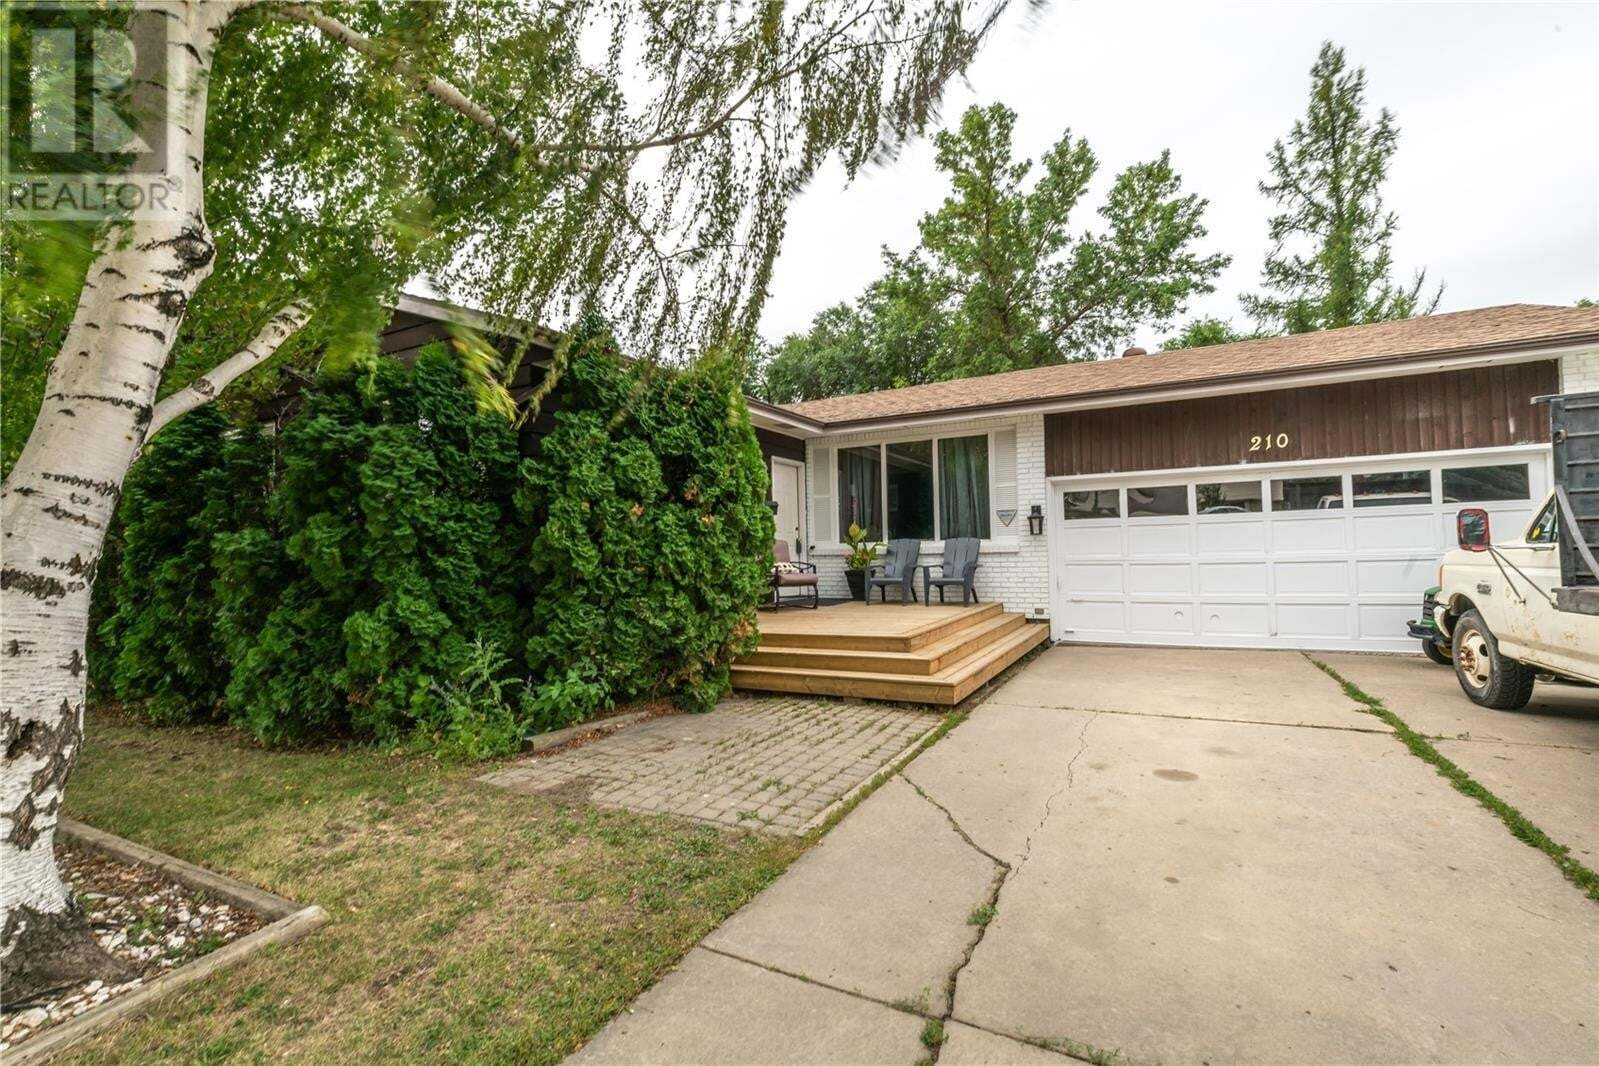 House for sale at 210 Begg Cres Saskatoon Saskatchewan - MLS: SK821182